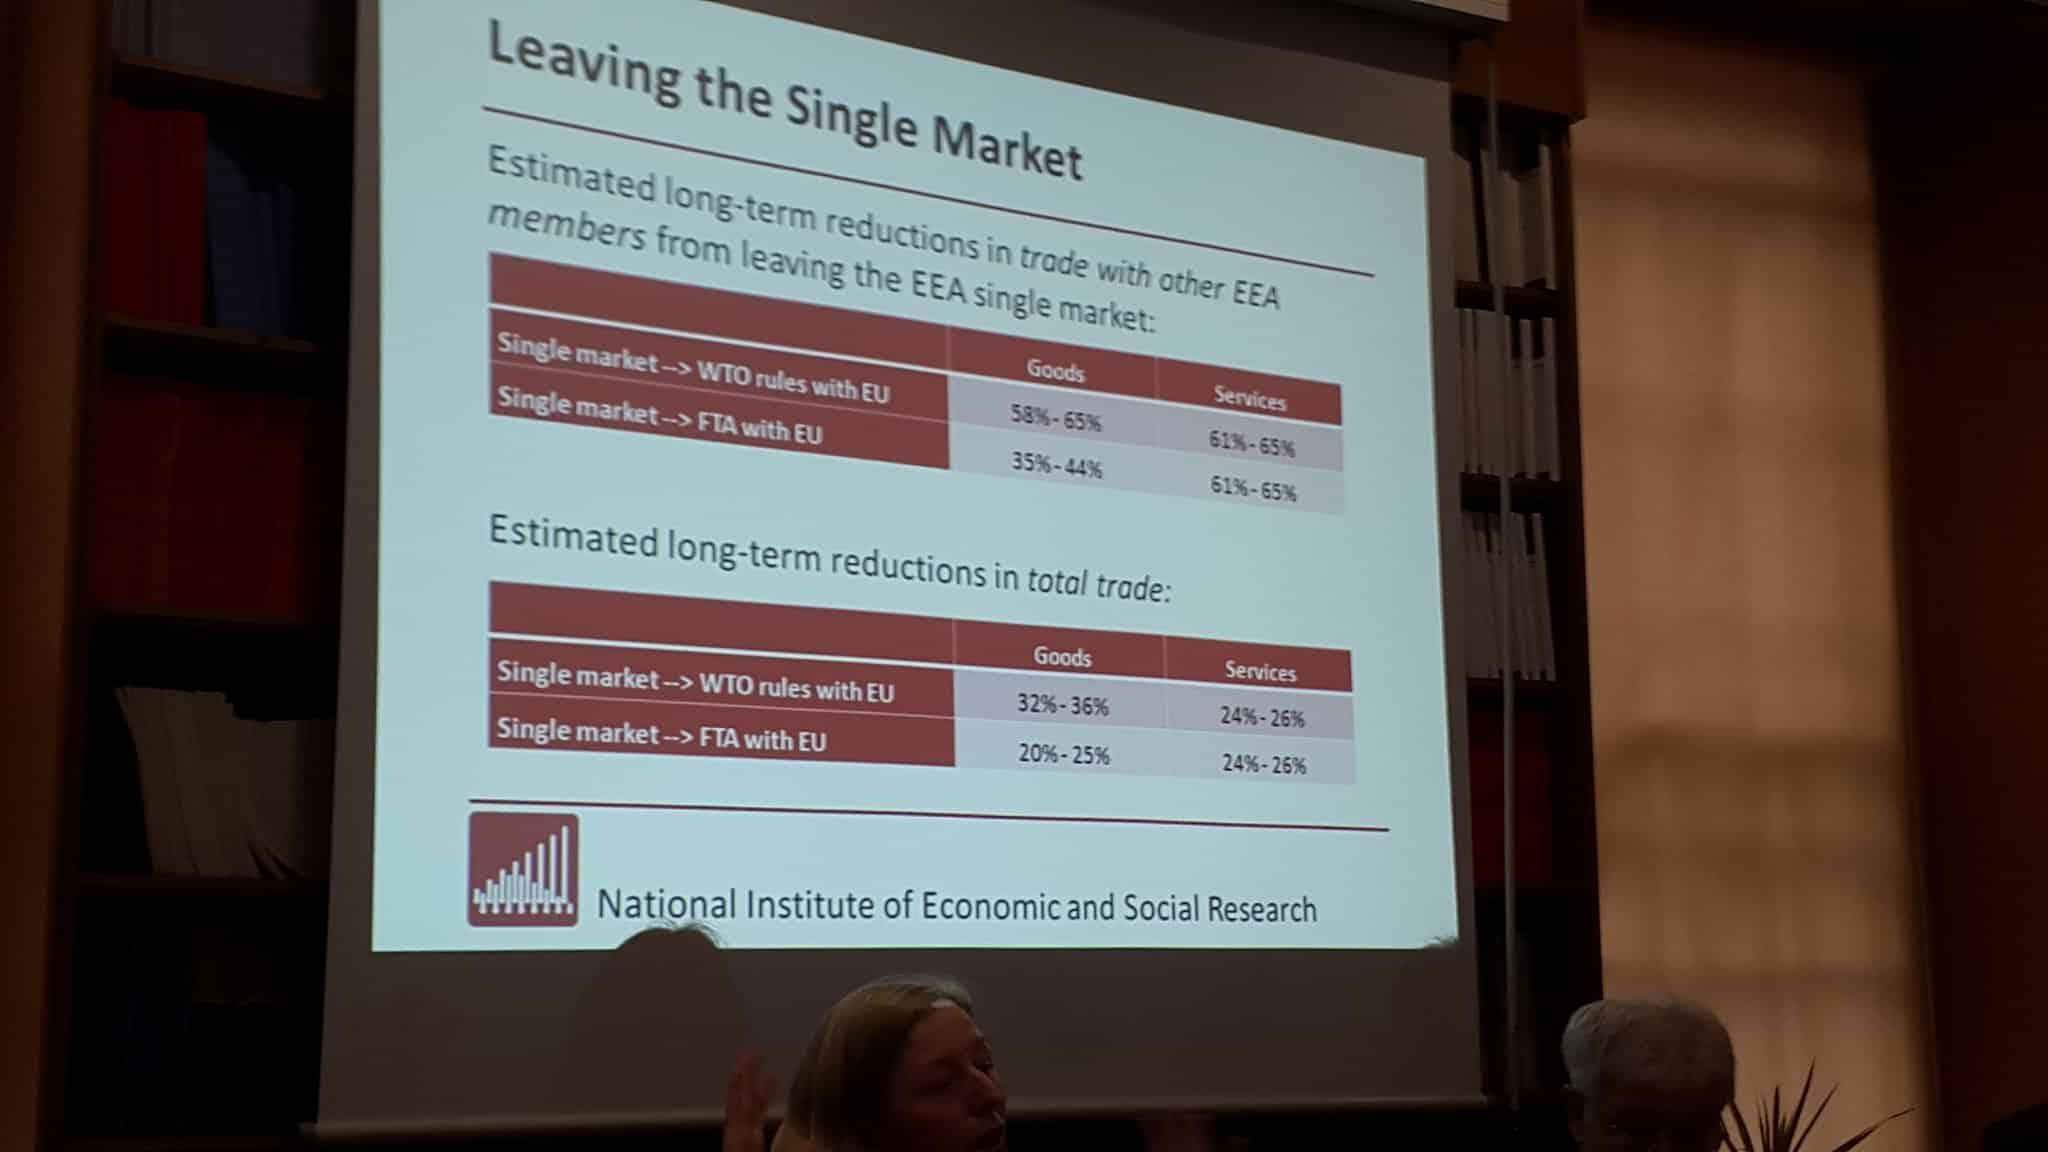 RT @jdportes: Impact of leaving…